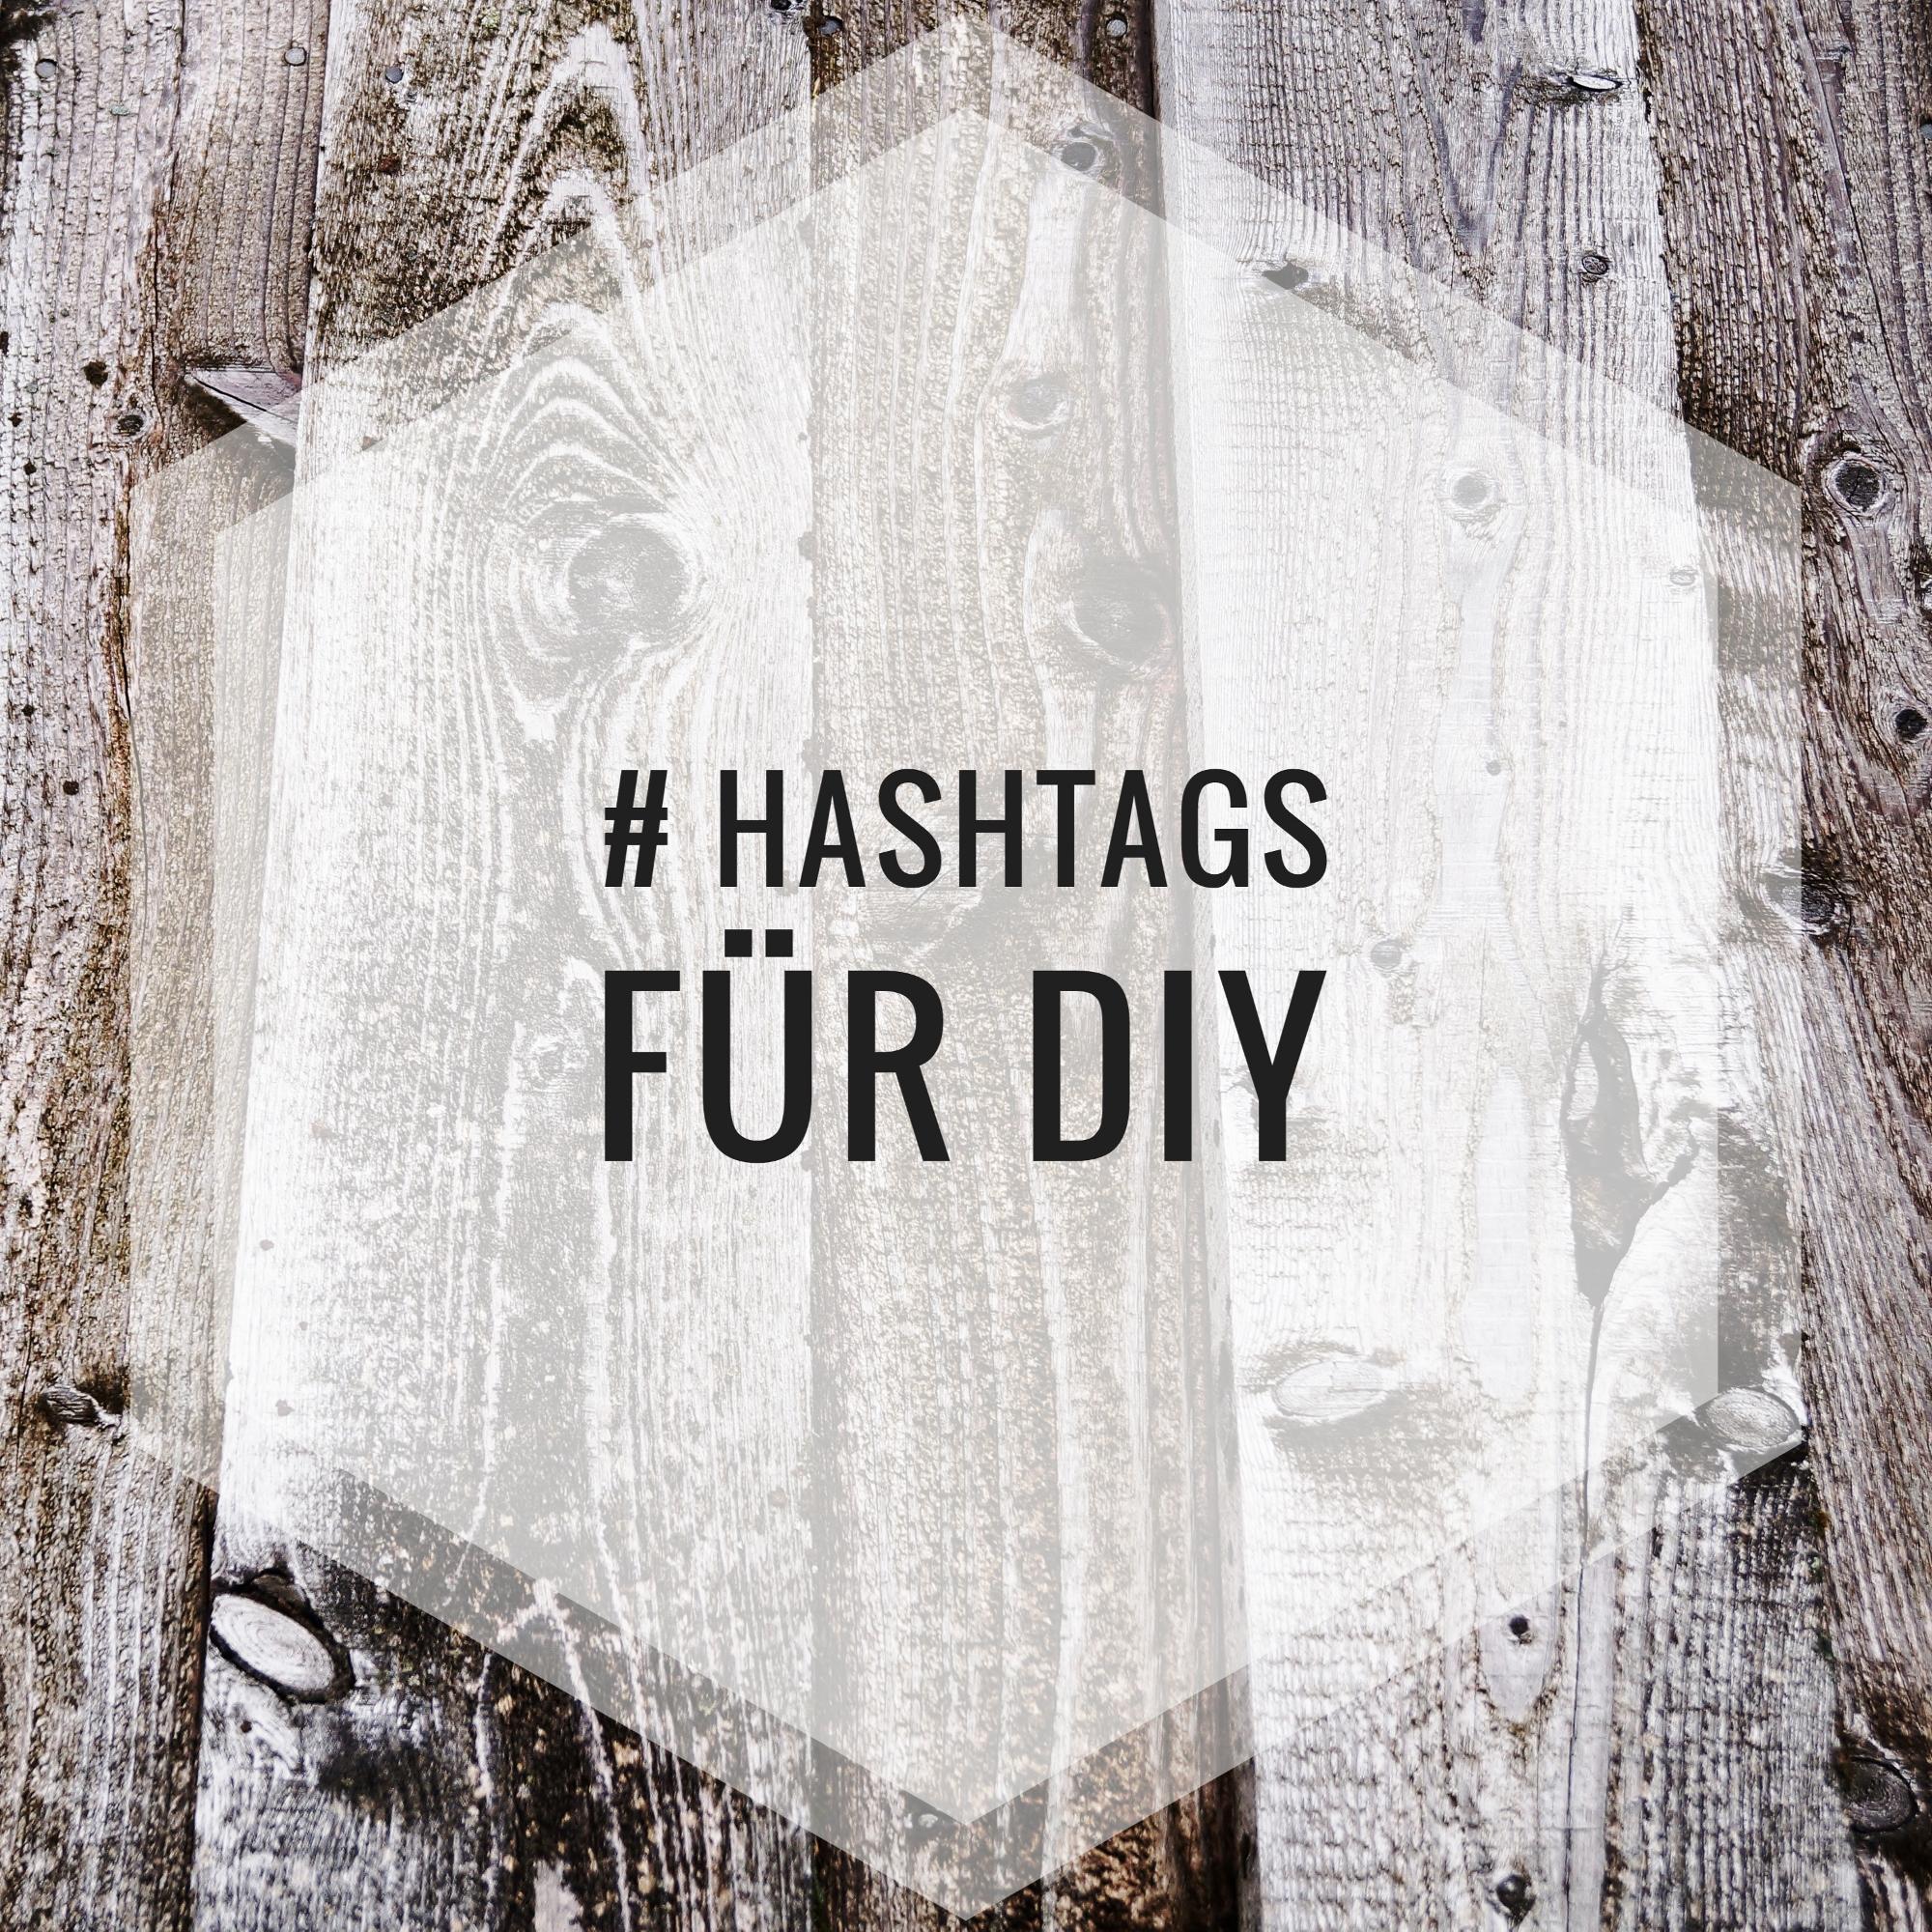 diy hashtags f r instagram deutsch englisch kreativ blog diy gadgets. Black Bedroom Furniture Sets. Home Design Ideas